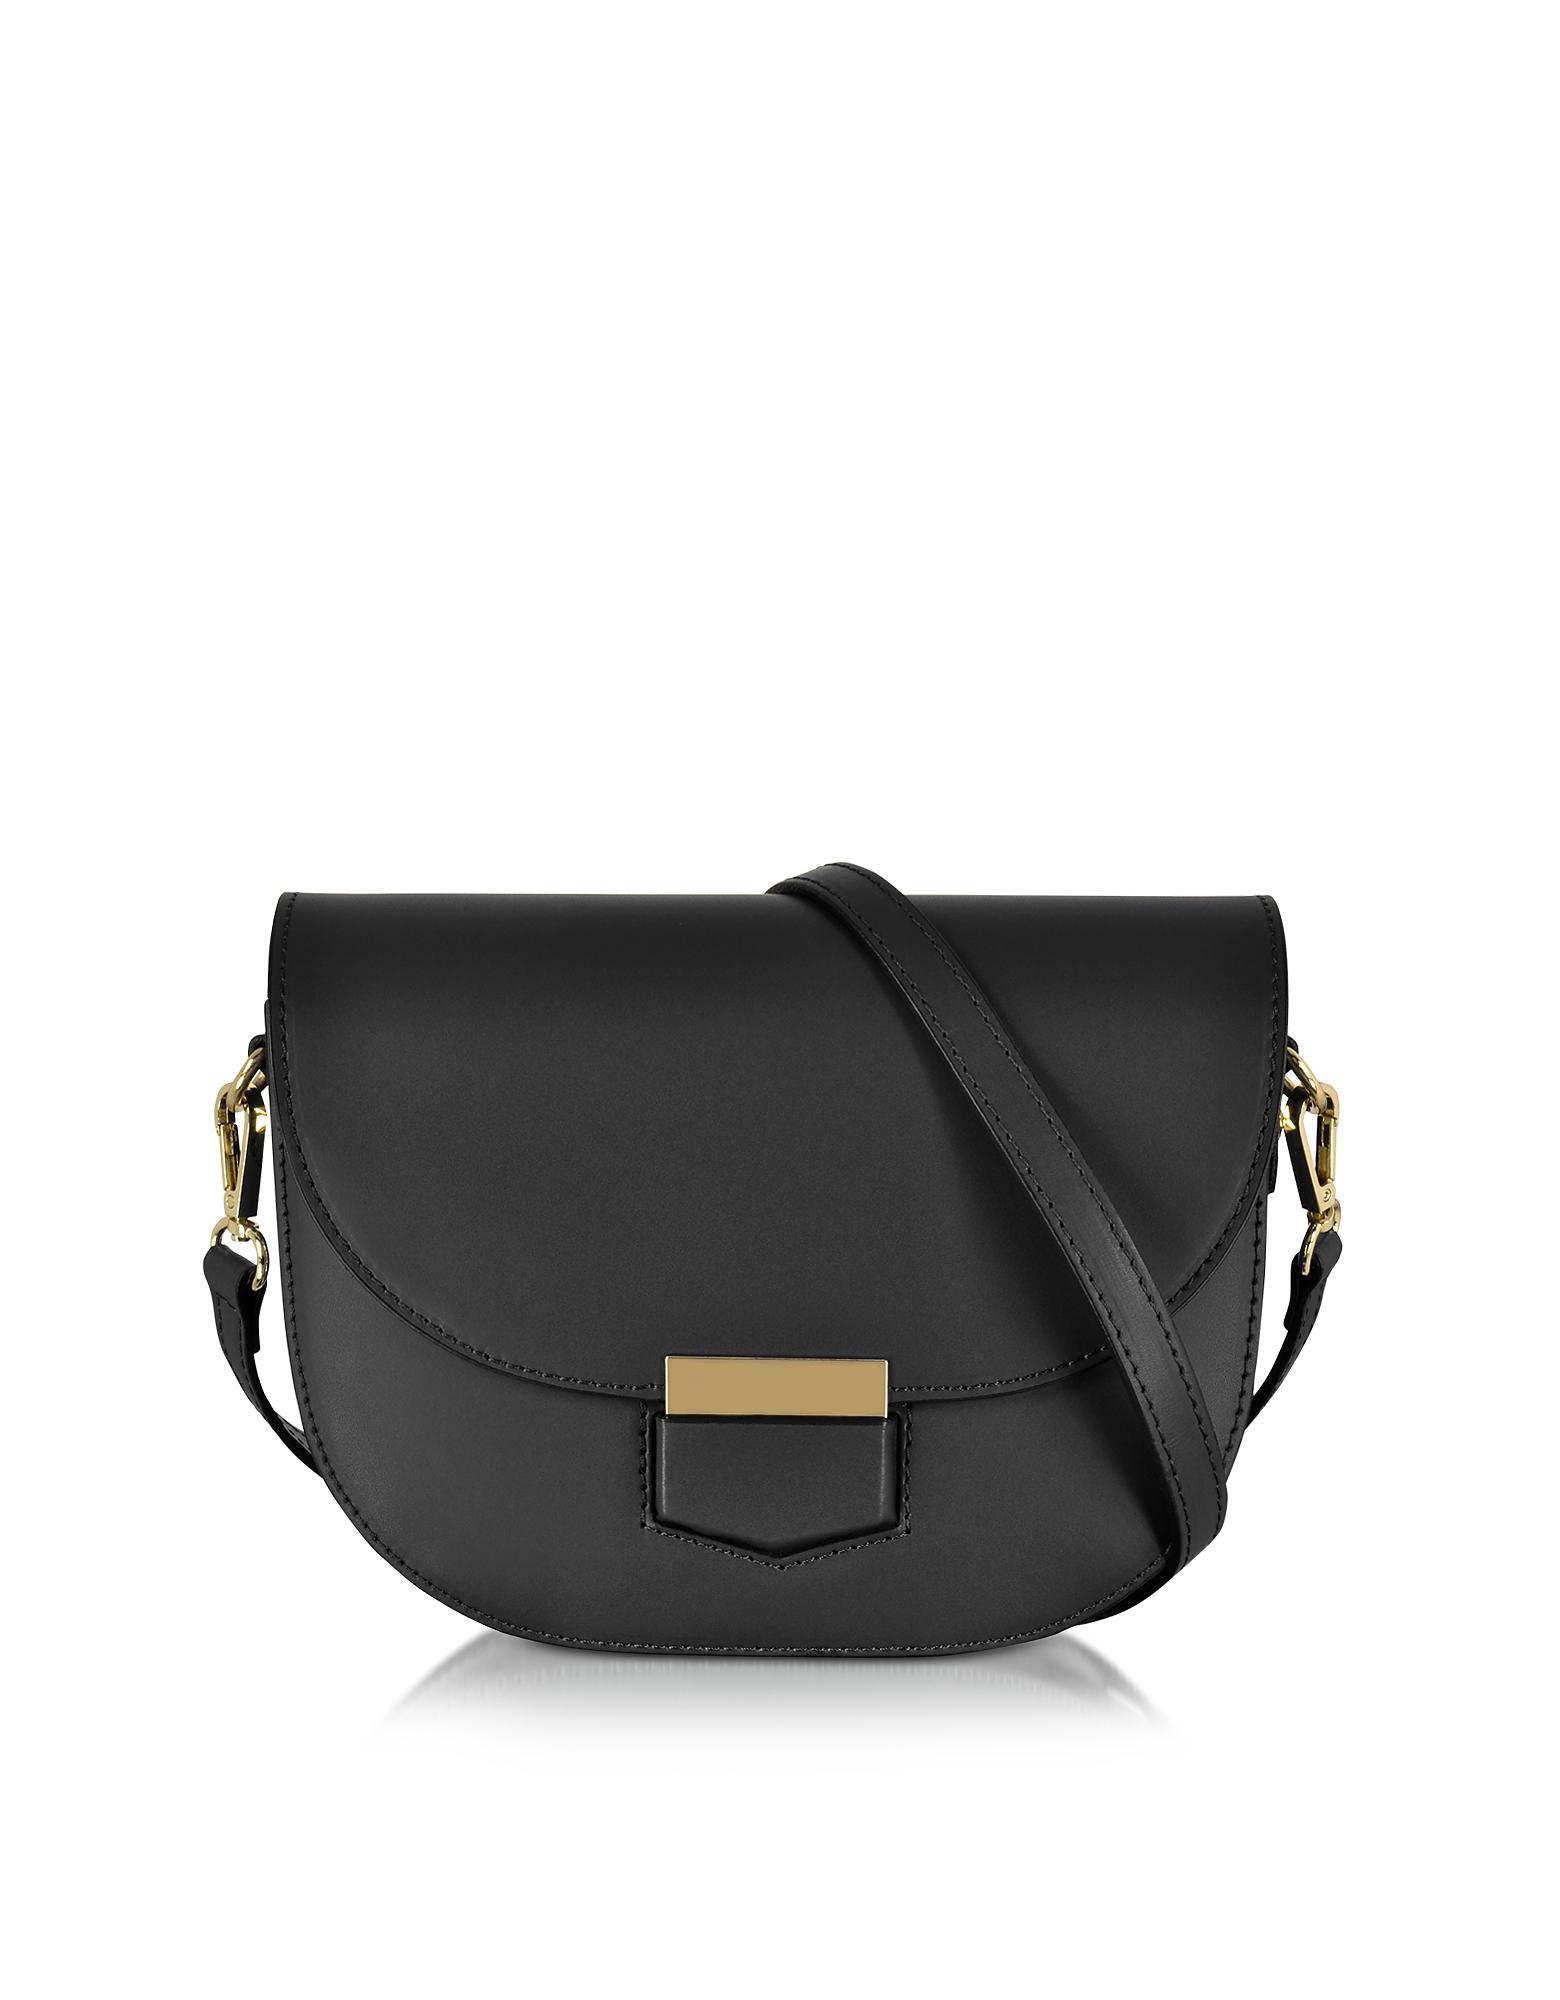 Le Parmentier Clio Smooth Leather Flap Shoulder Bag in Black - Lyst 841fe217347af